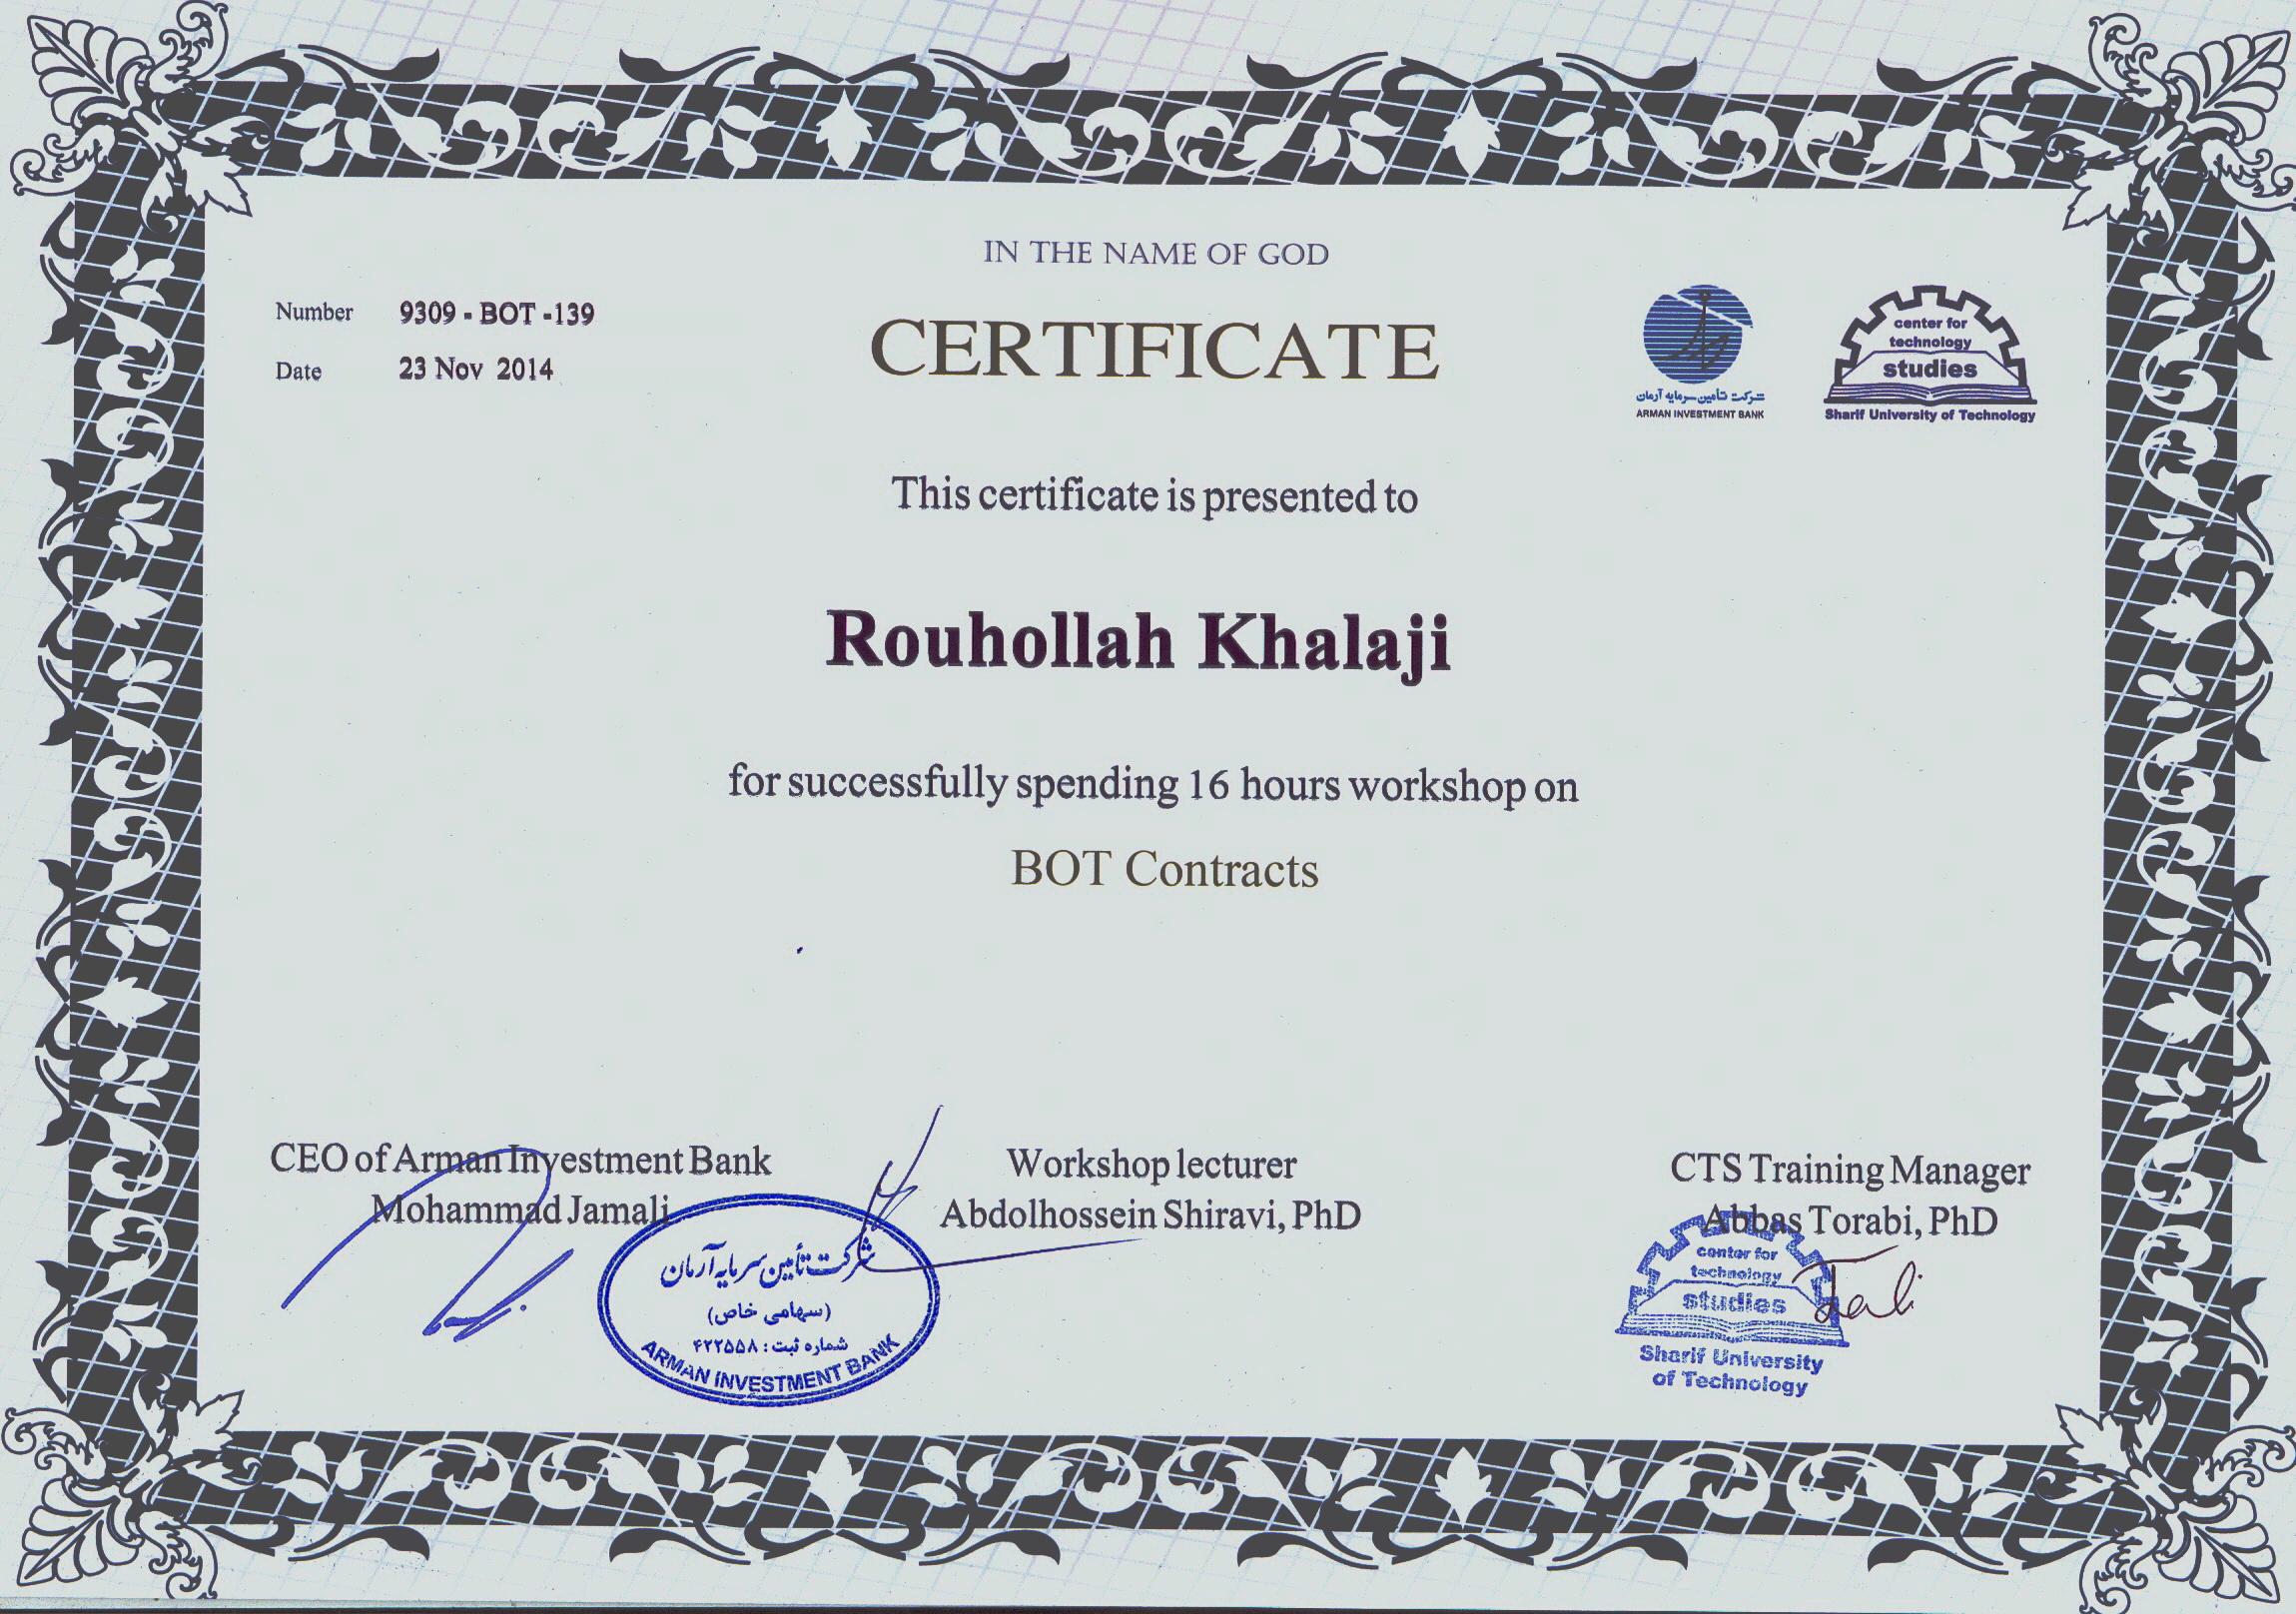 Rouhollah Khalaji, روح اله خلجی